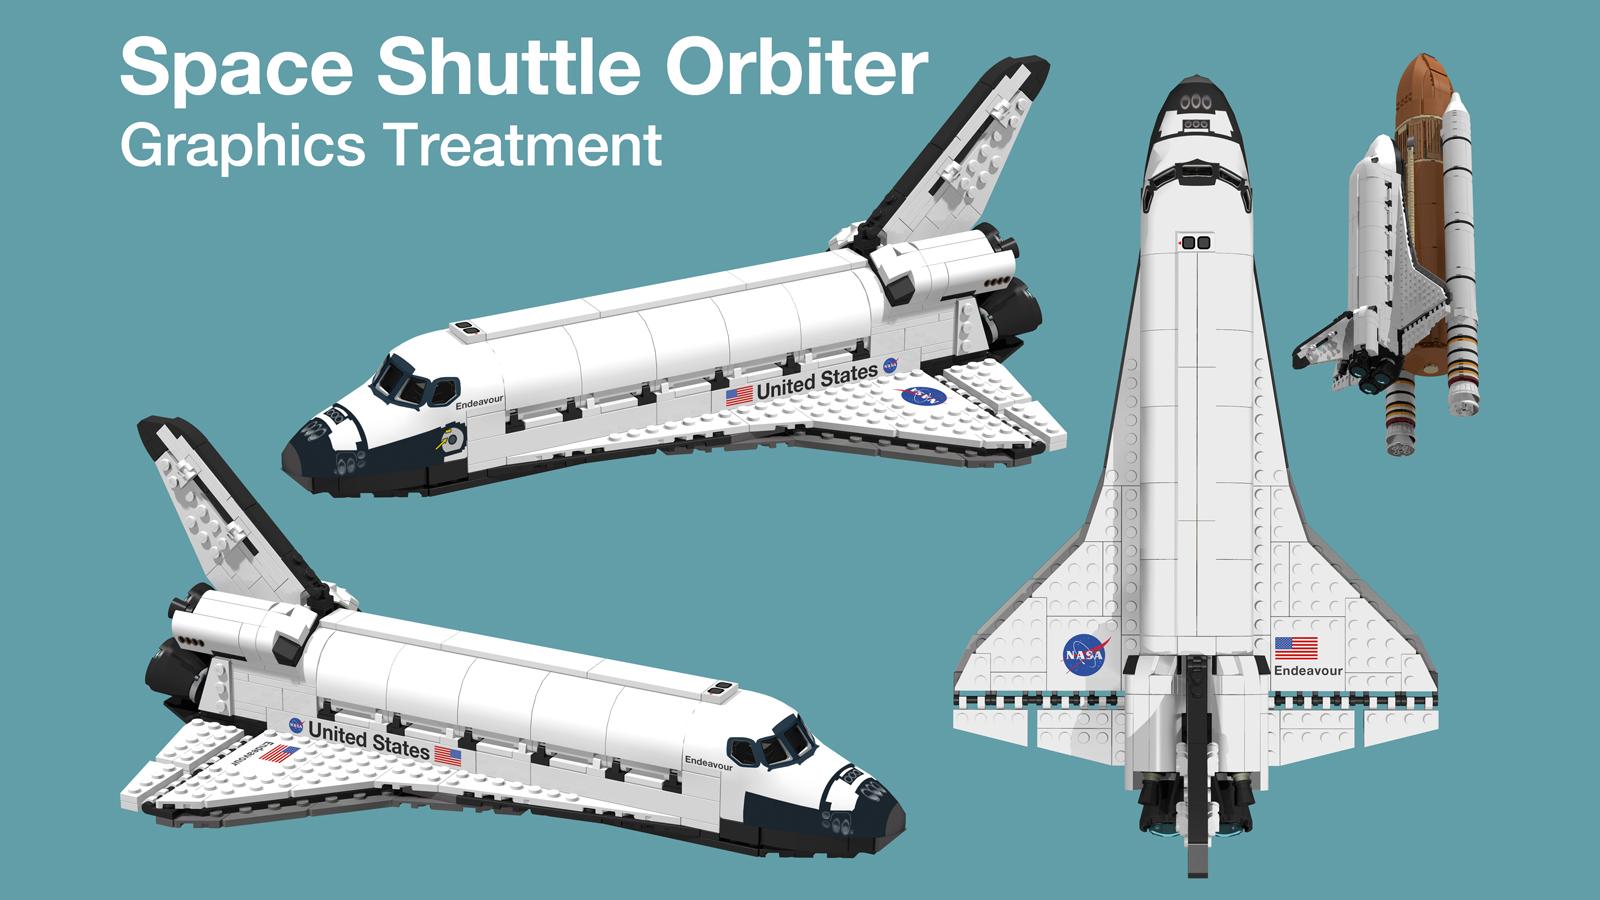 astronaut space shuttle - photo #36